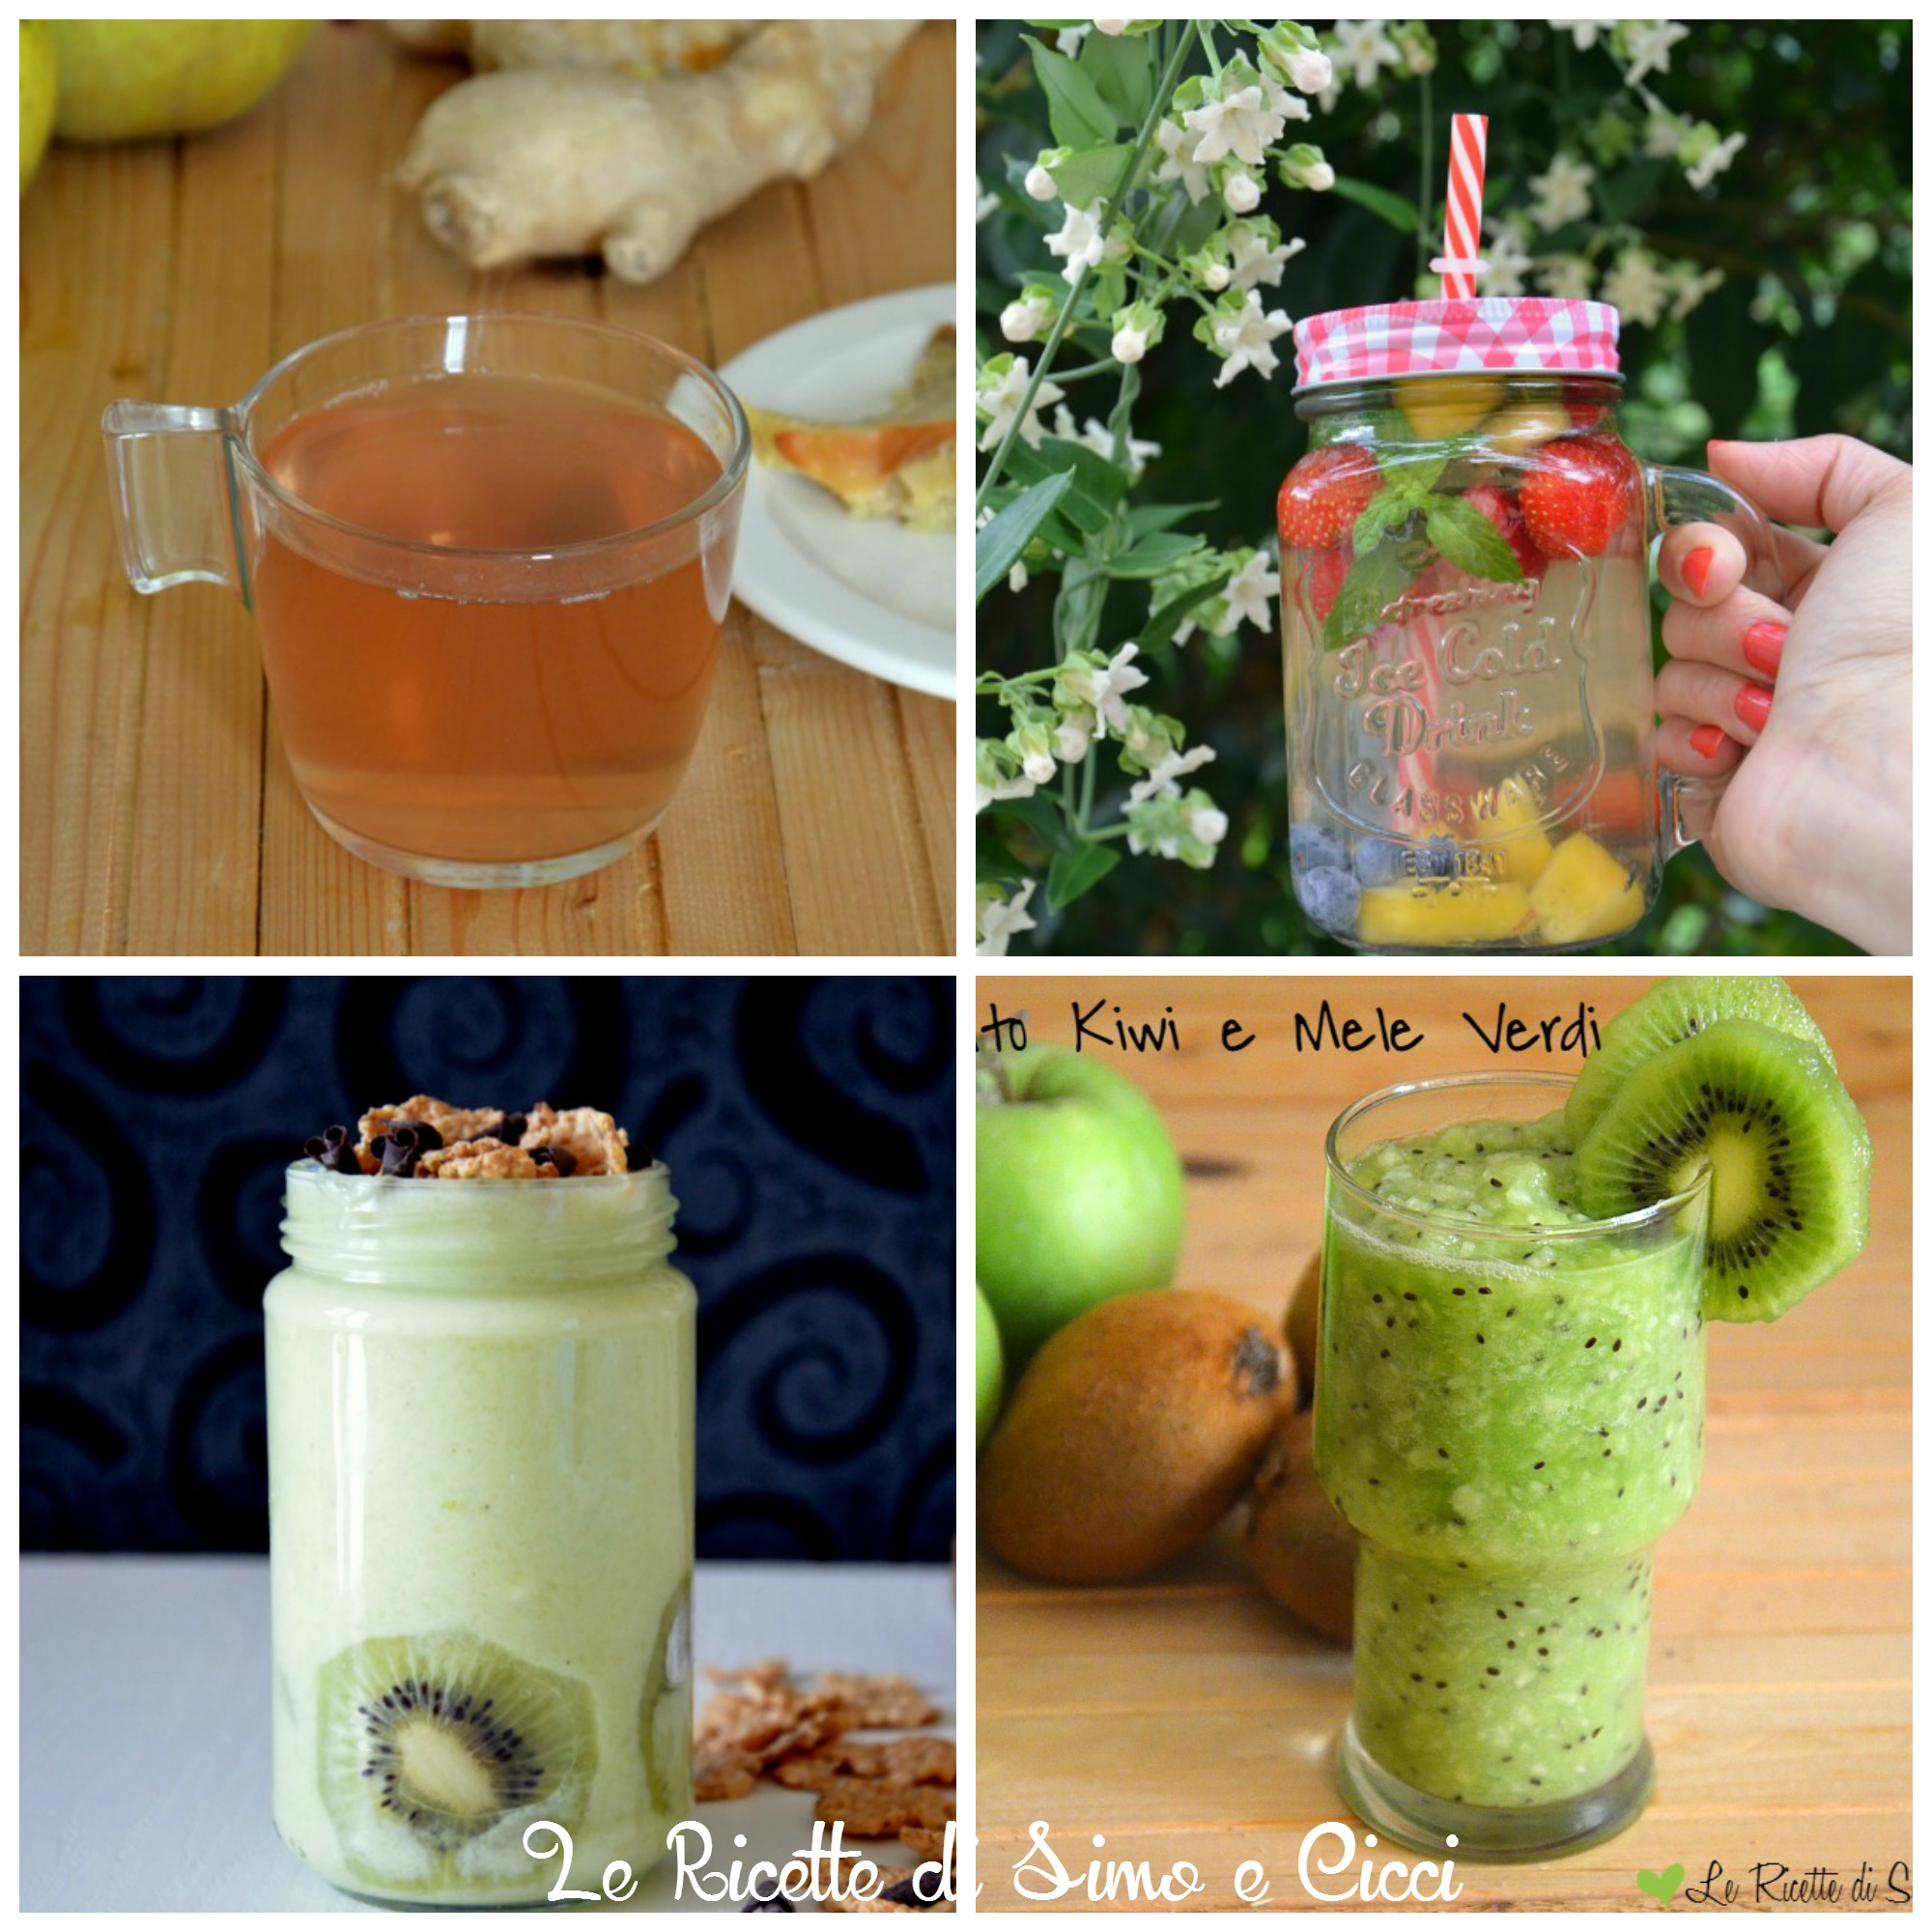 Bevande detox: 4 ricette homemade con frutta e verdura